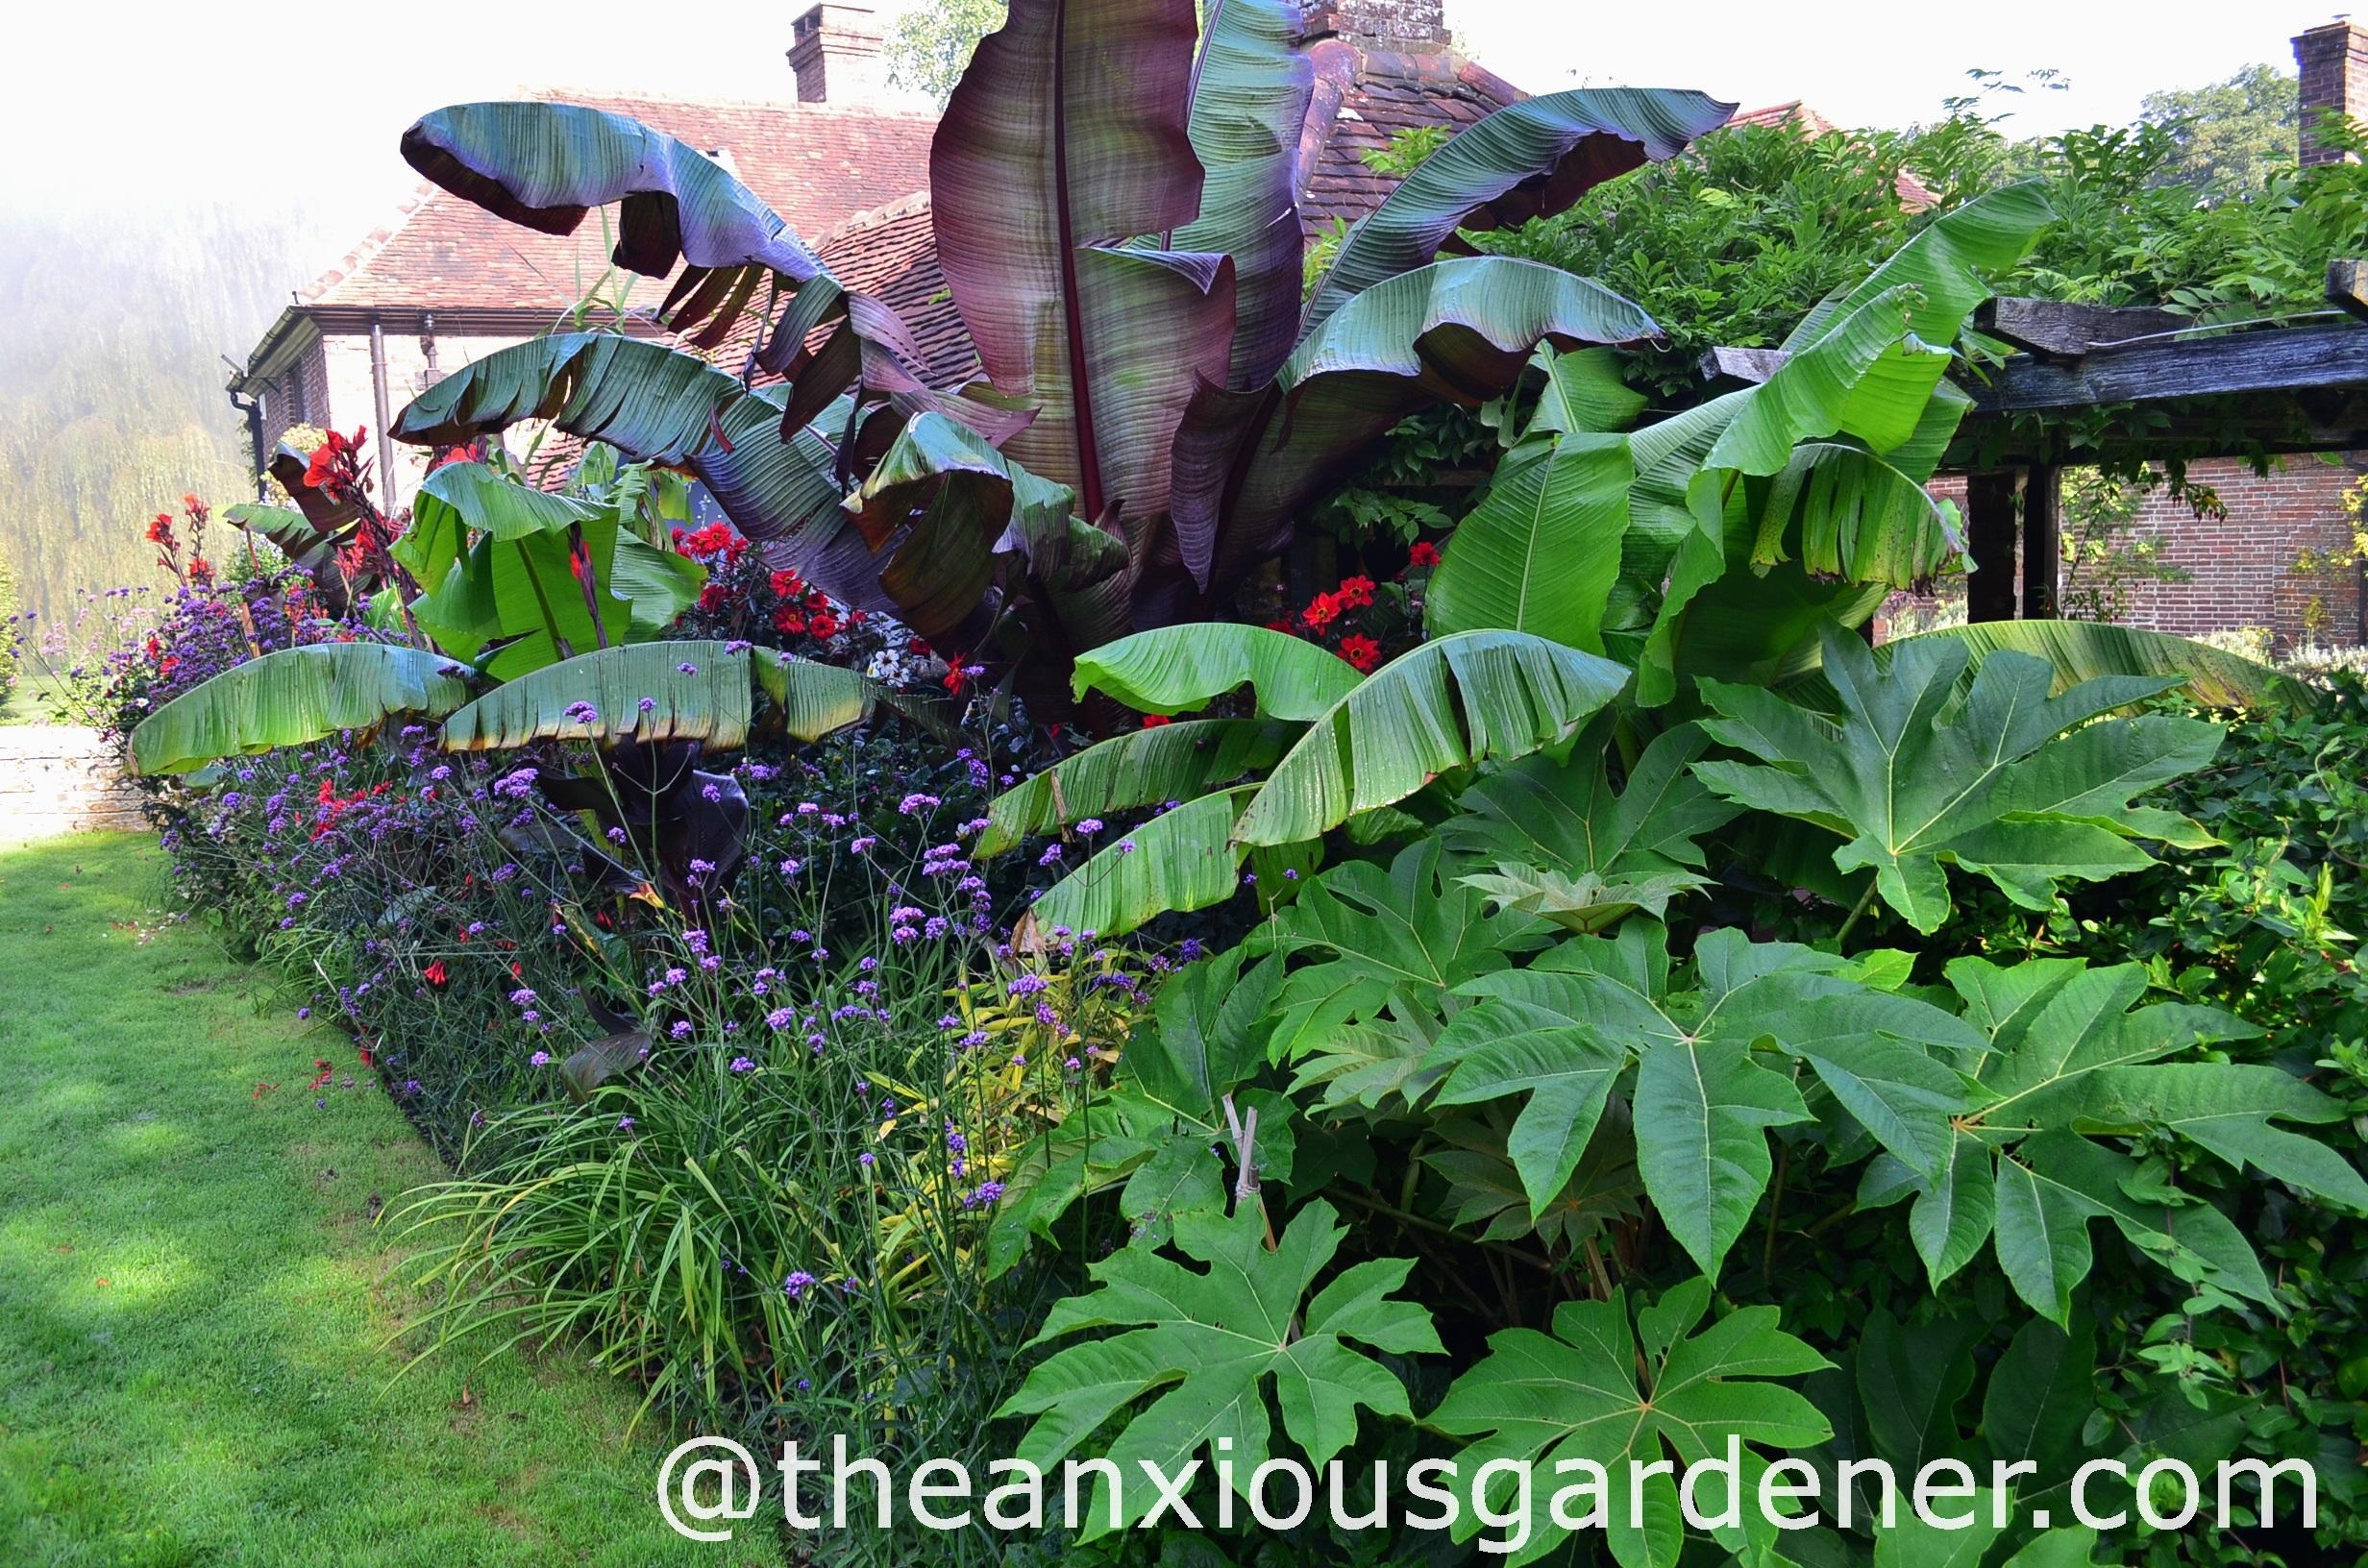 Ensete maurelii the anxious gardener for Hardy plants for the garden